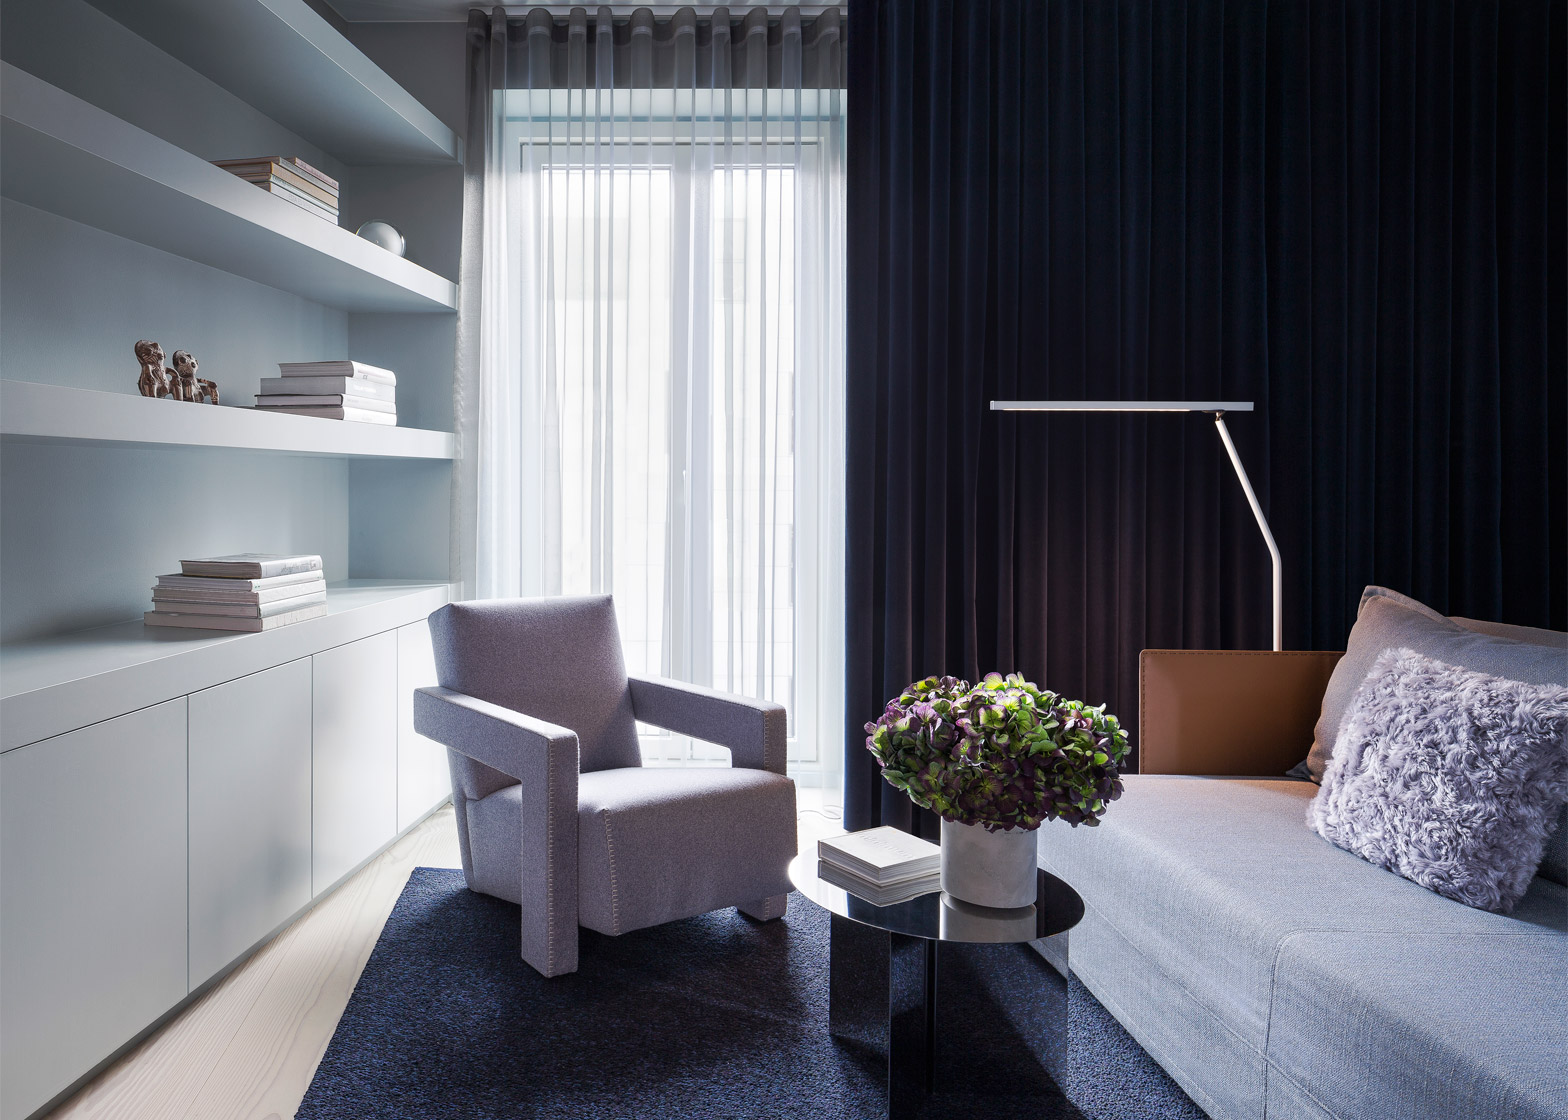 Дизайн однокомнатной квартиры с текстилем